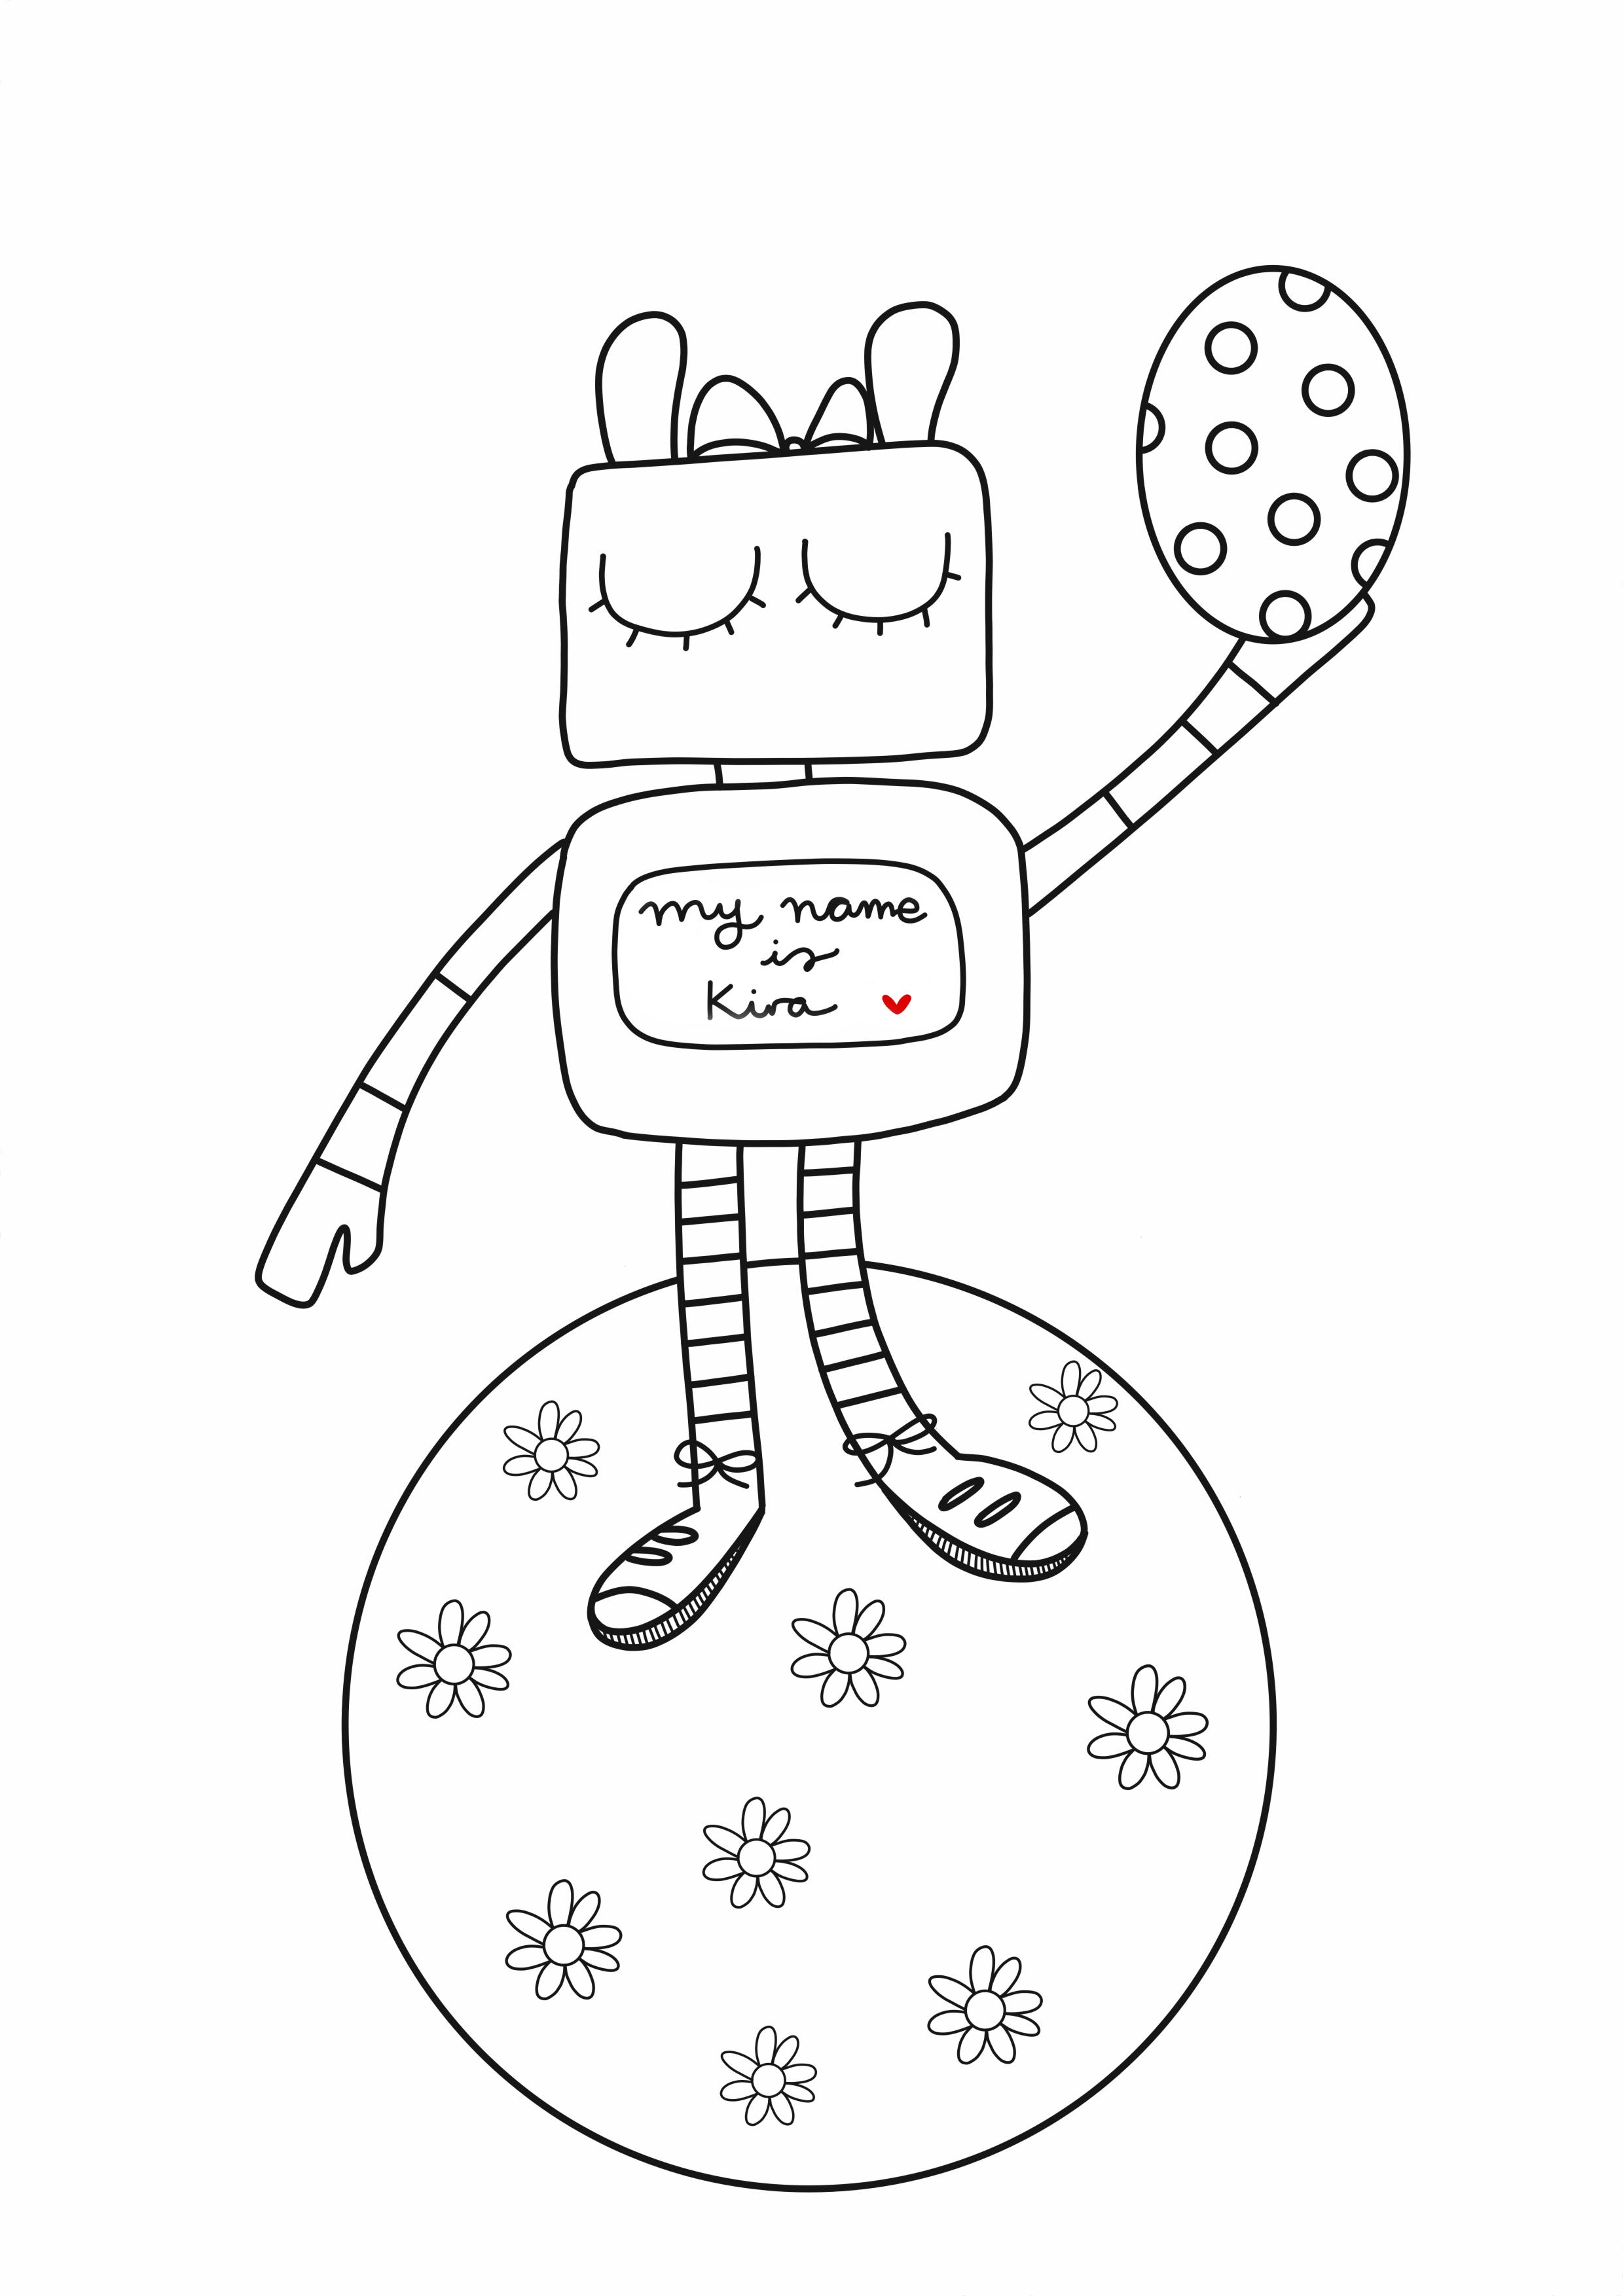 Dibujo del robot Kira para colorear